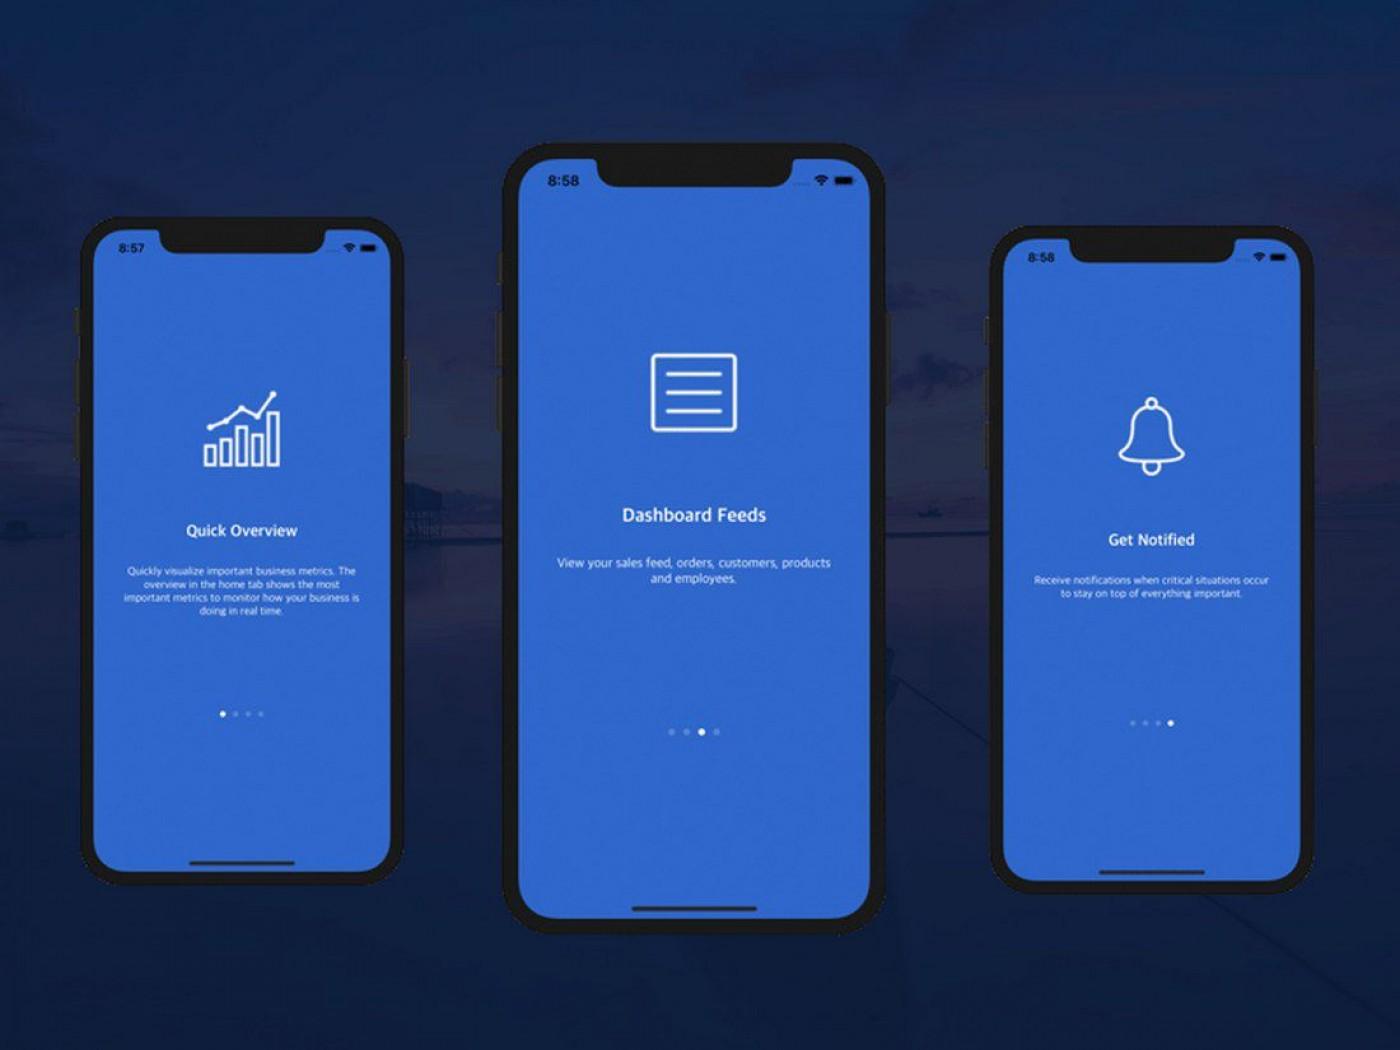 004 Top Iphone App Design Template Concept  X Io Sketch1400